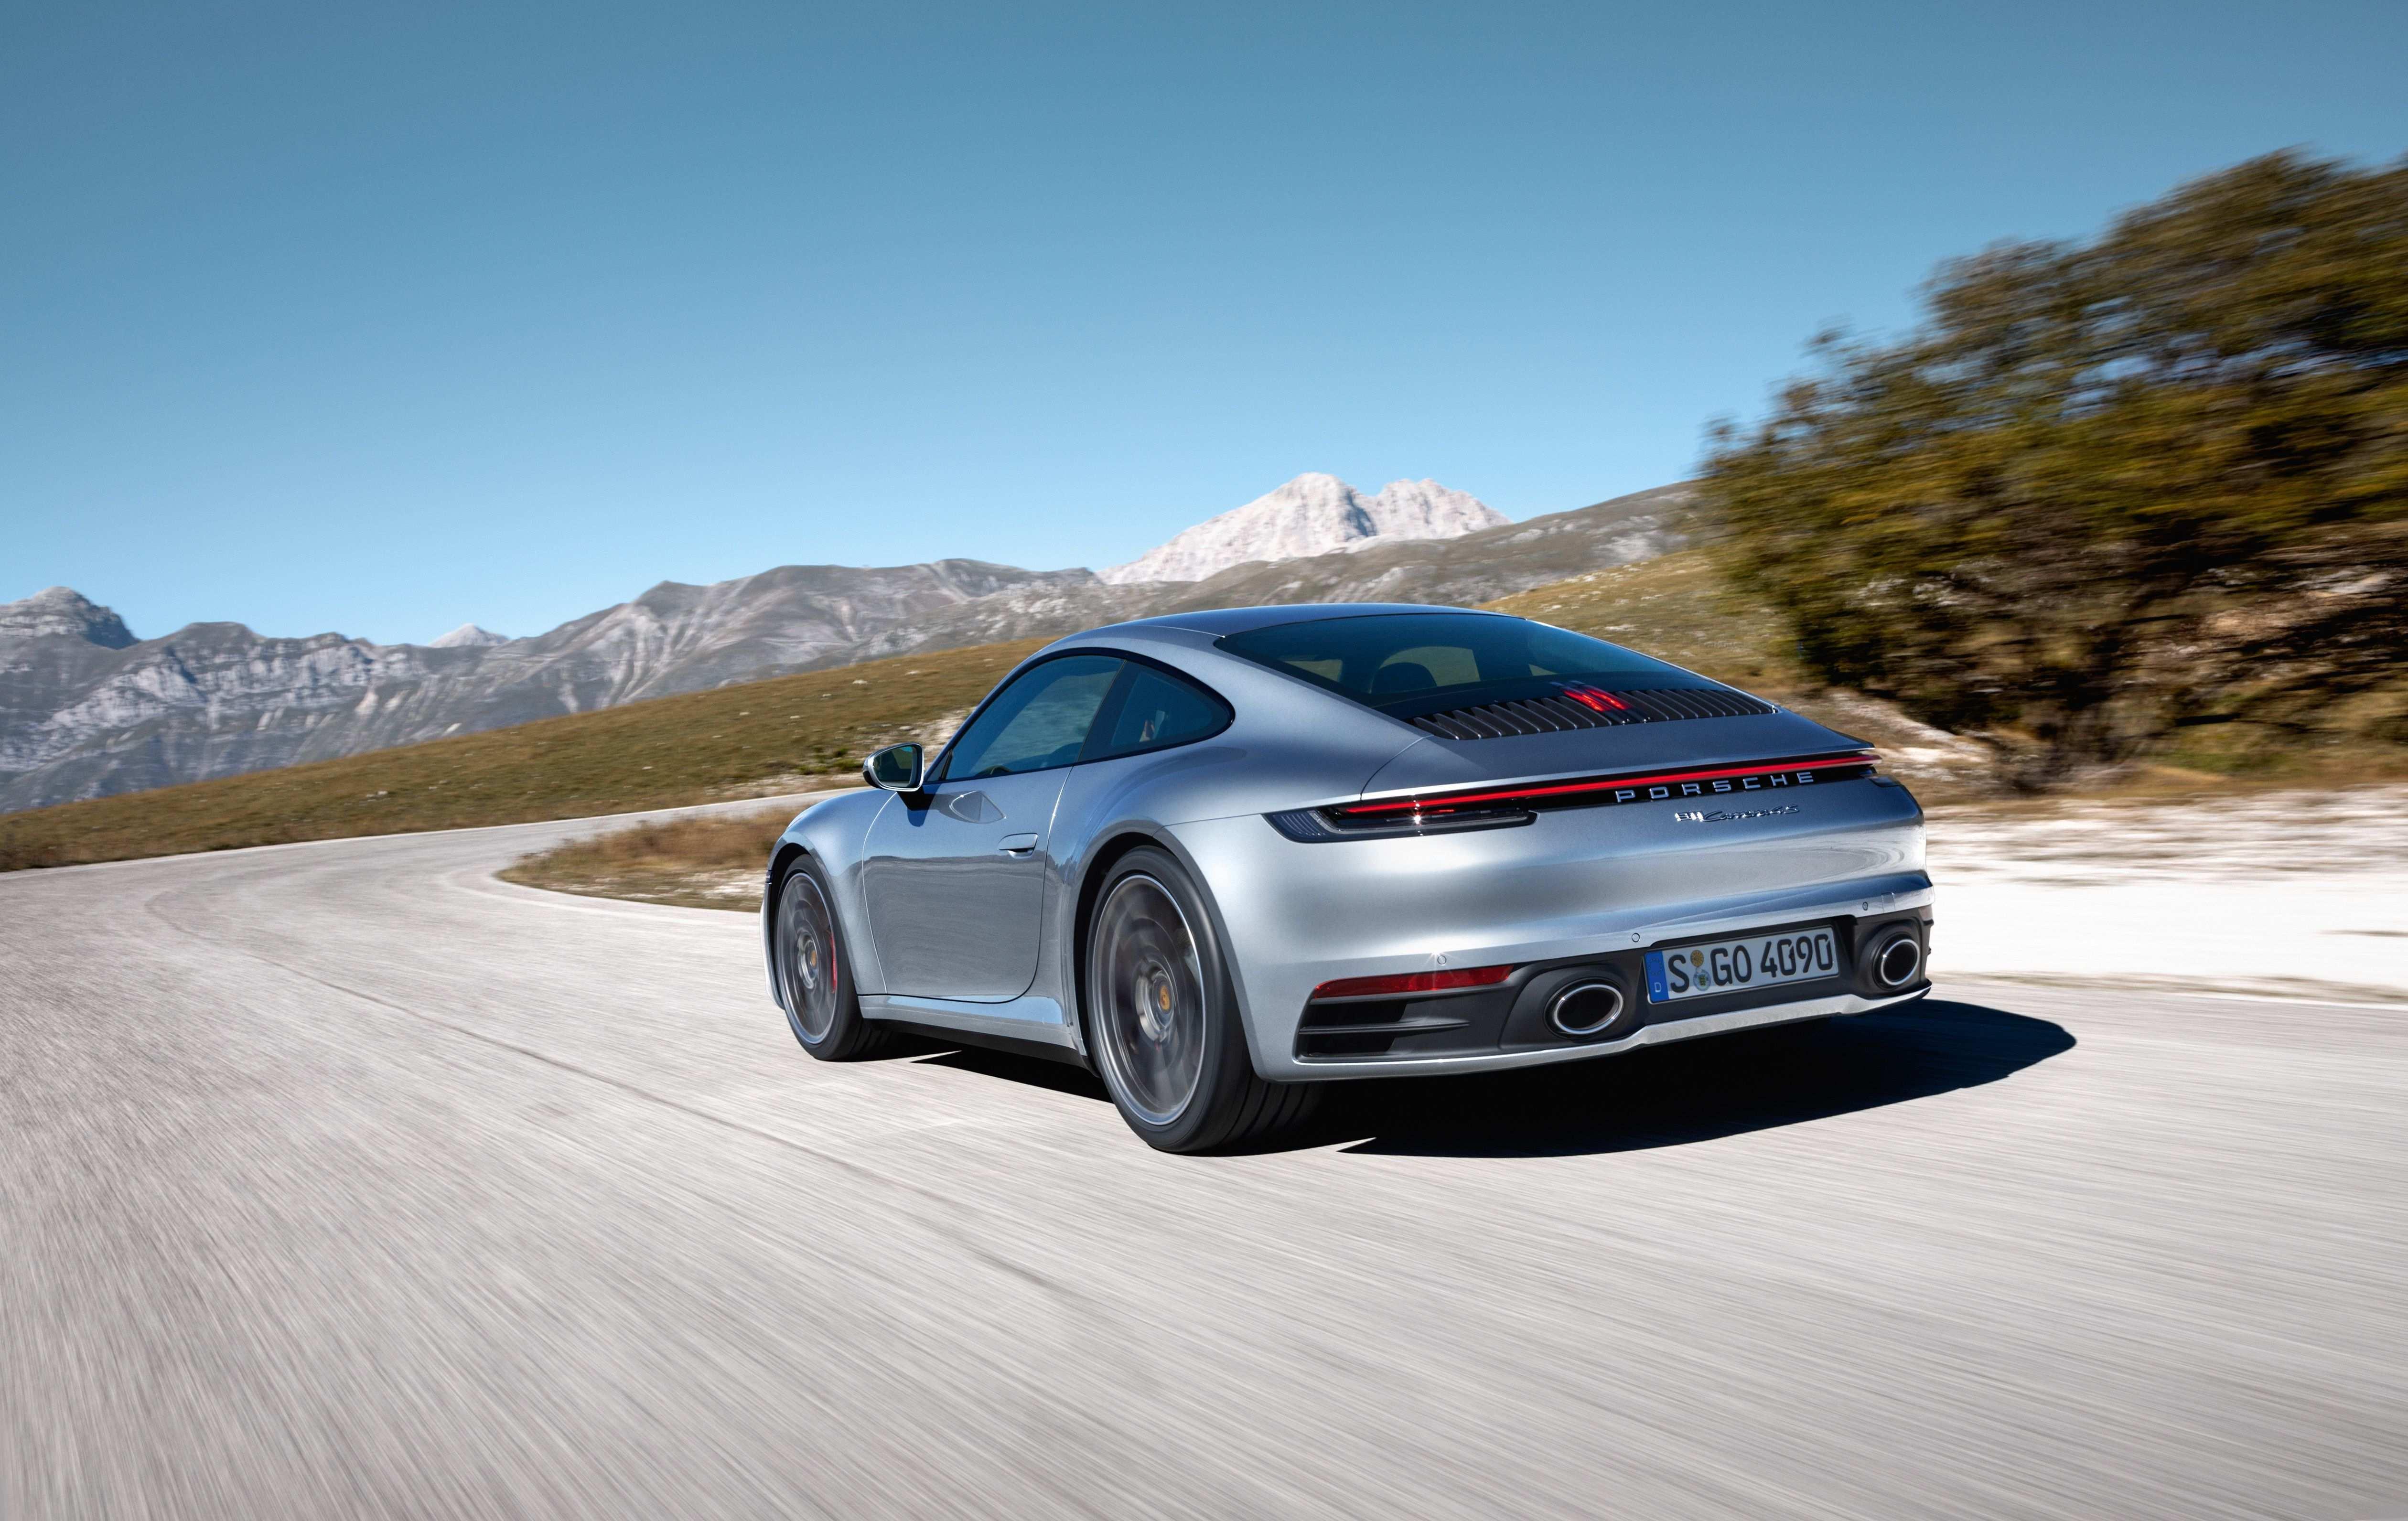 73 All New 2020 Porsche Spesification by 2020 Porsche